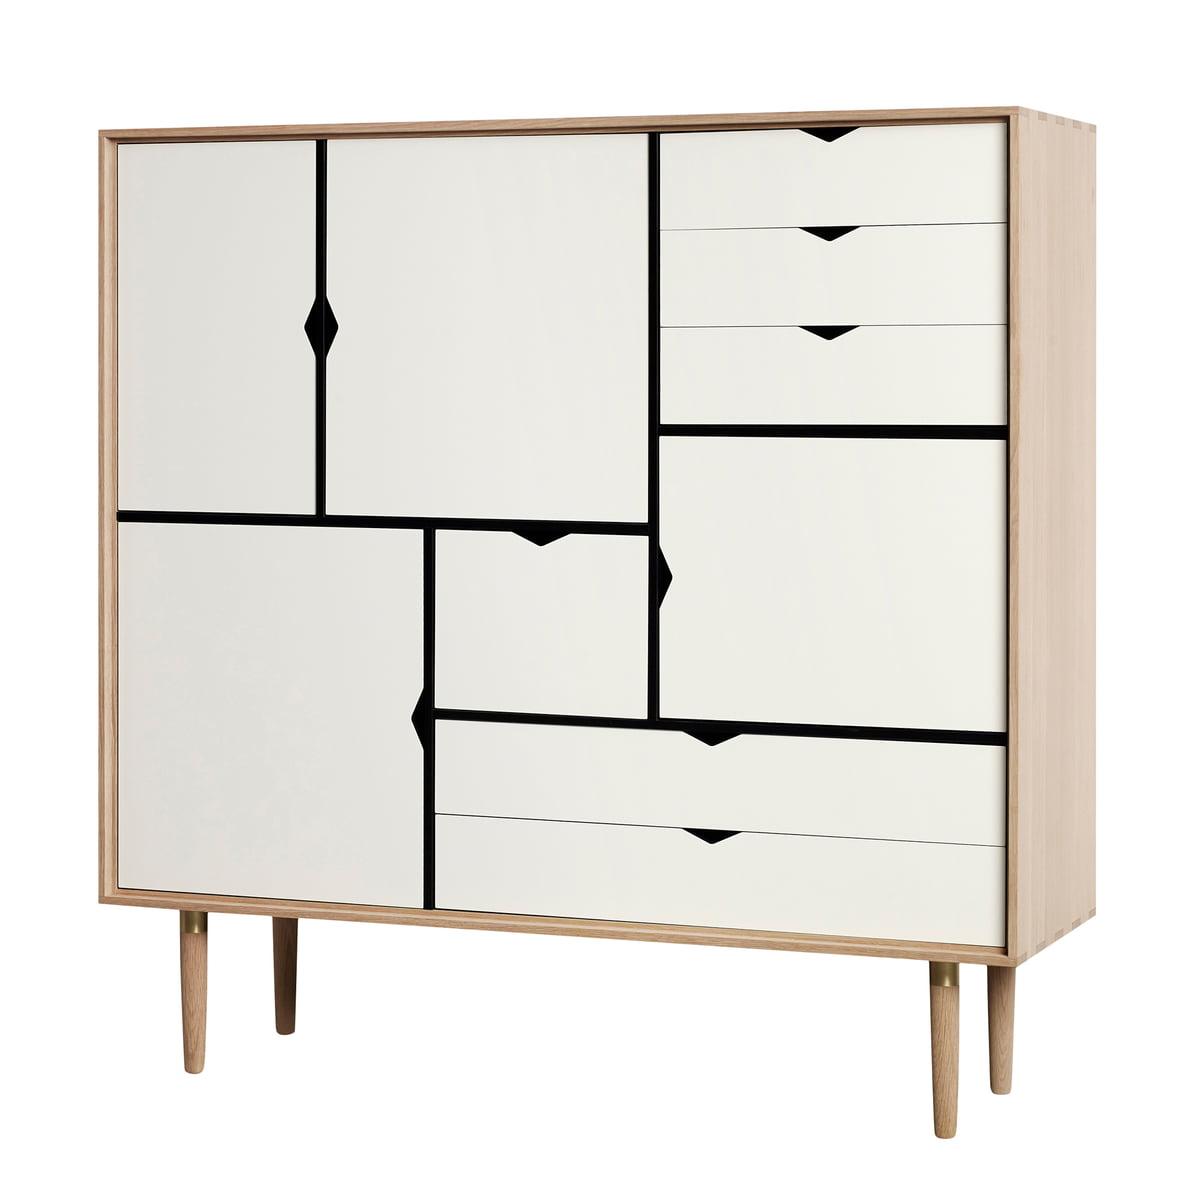 s3 kommode einfarbig von andersen furniture. Black Bedroom Furniture Sets. Home Design Ideas